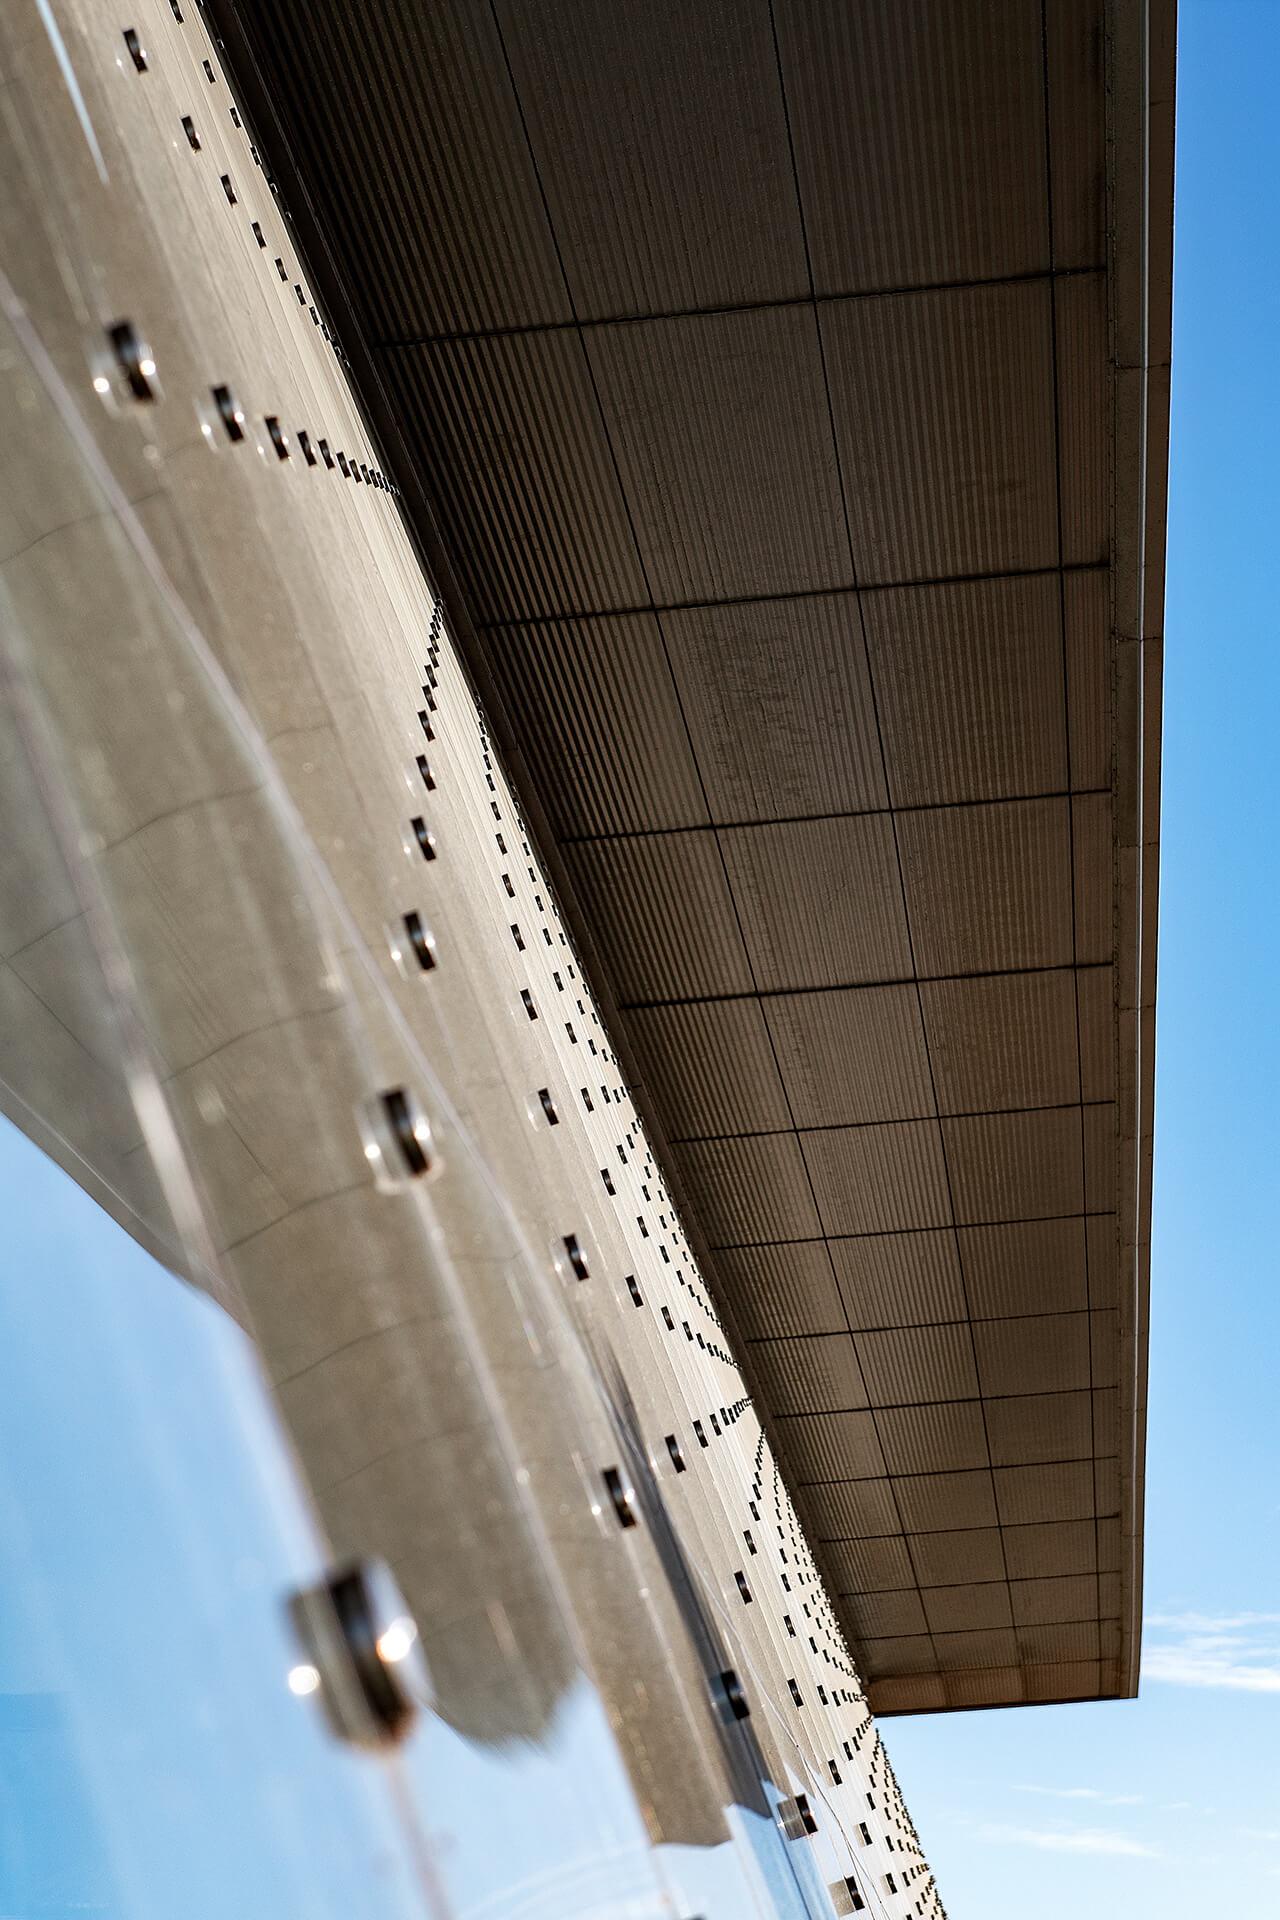 Unieke Architectuur - Delta Plaza Neeltje Jans (Vrouwenpolder) - geveldetail